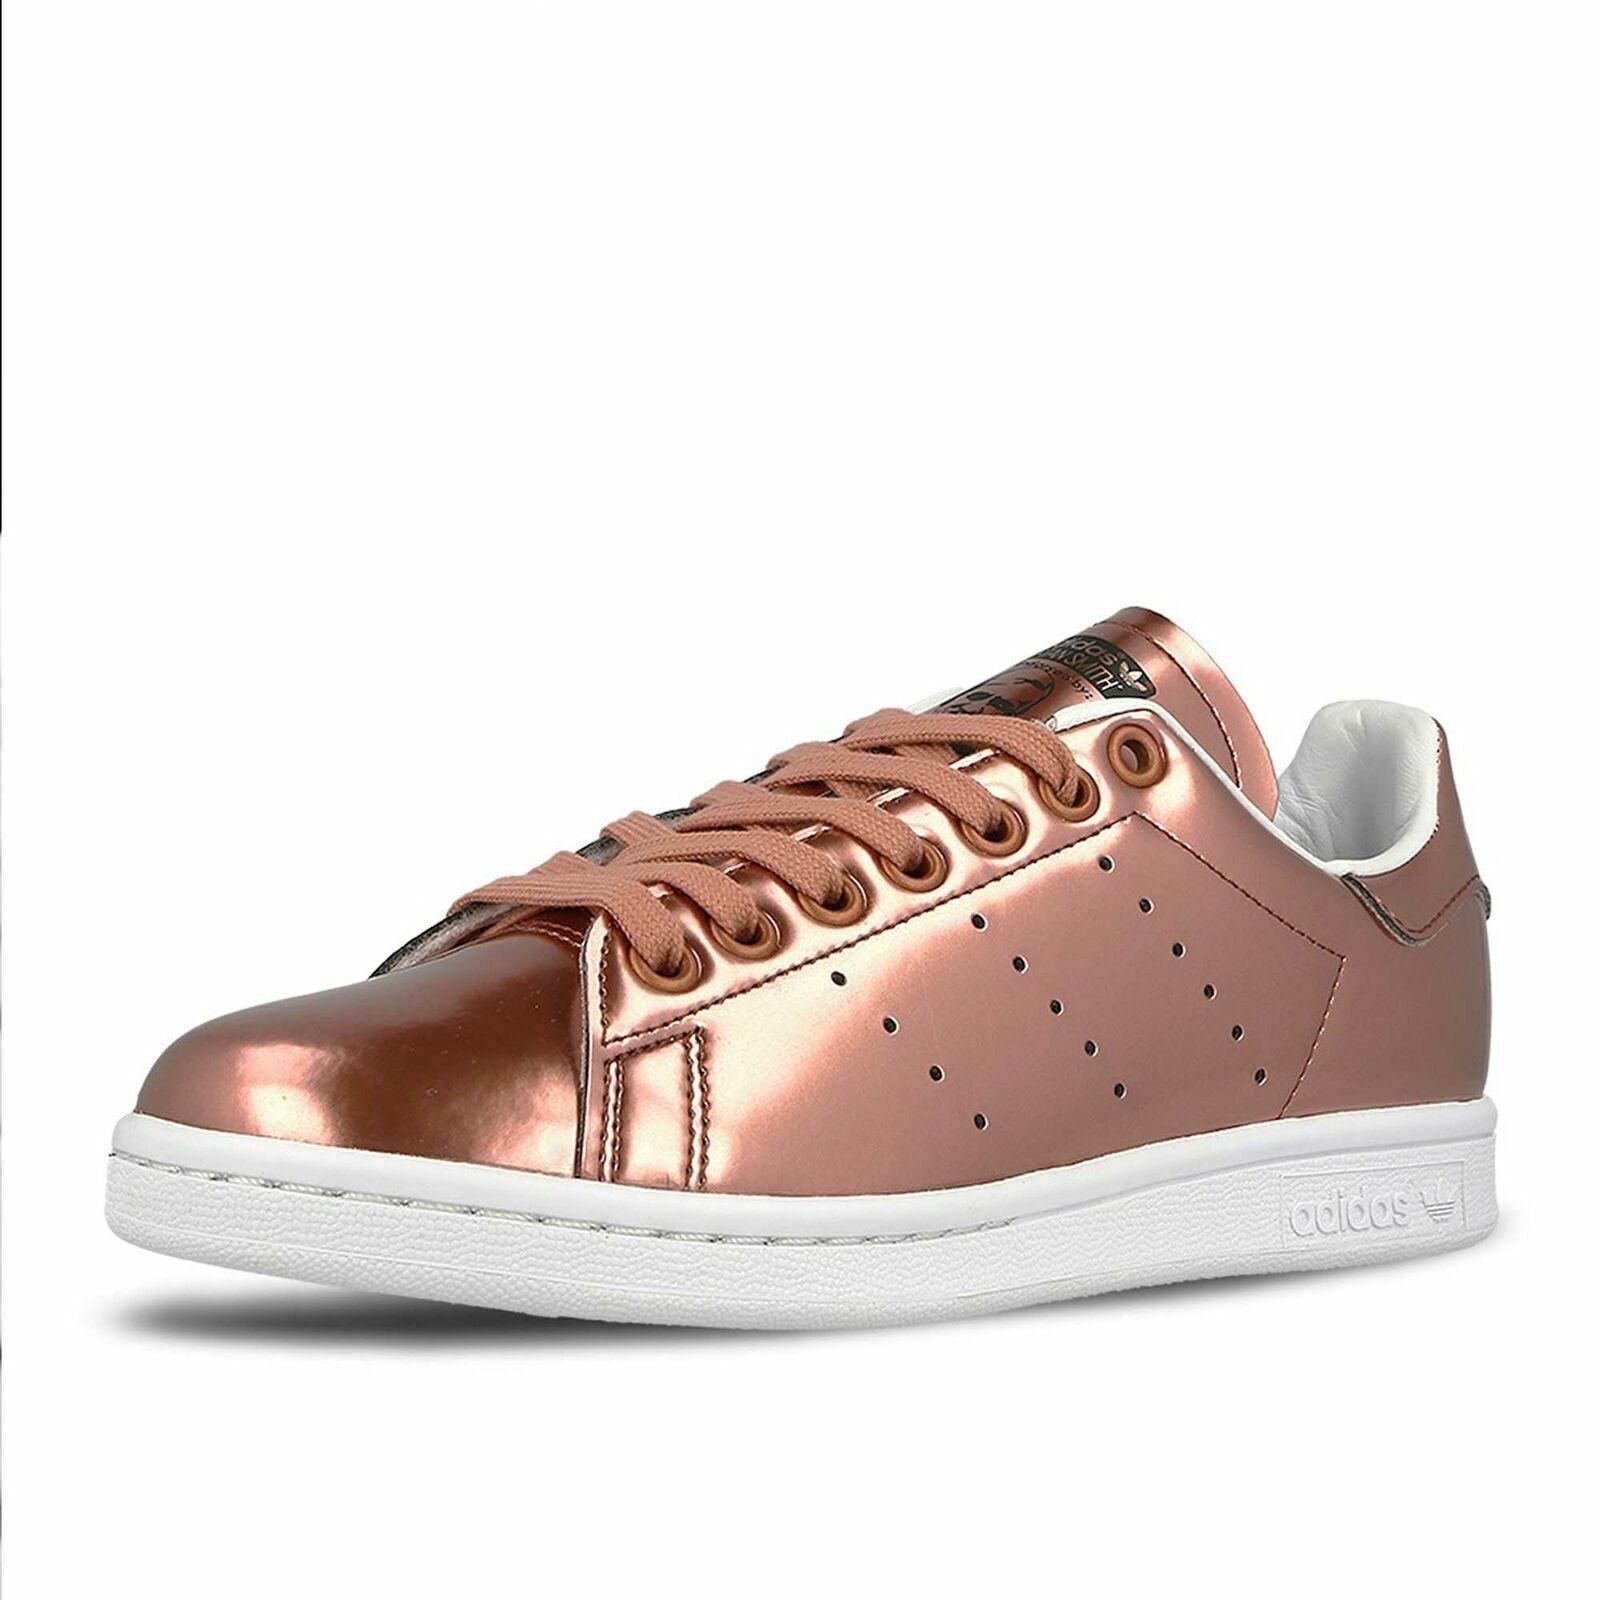 Adidas Originals Stan Smith CG3678 Women's Retro shoes Sneakers Metallic Copper